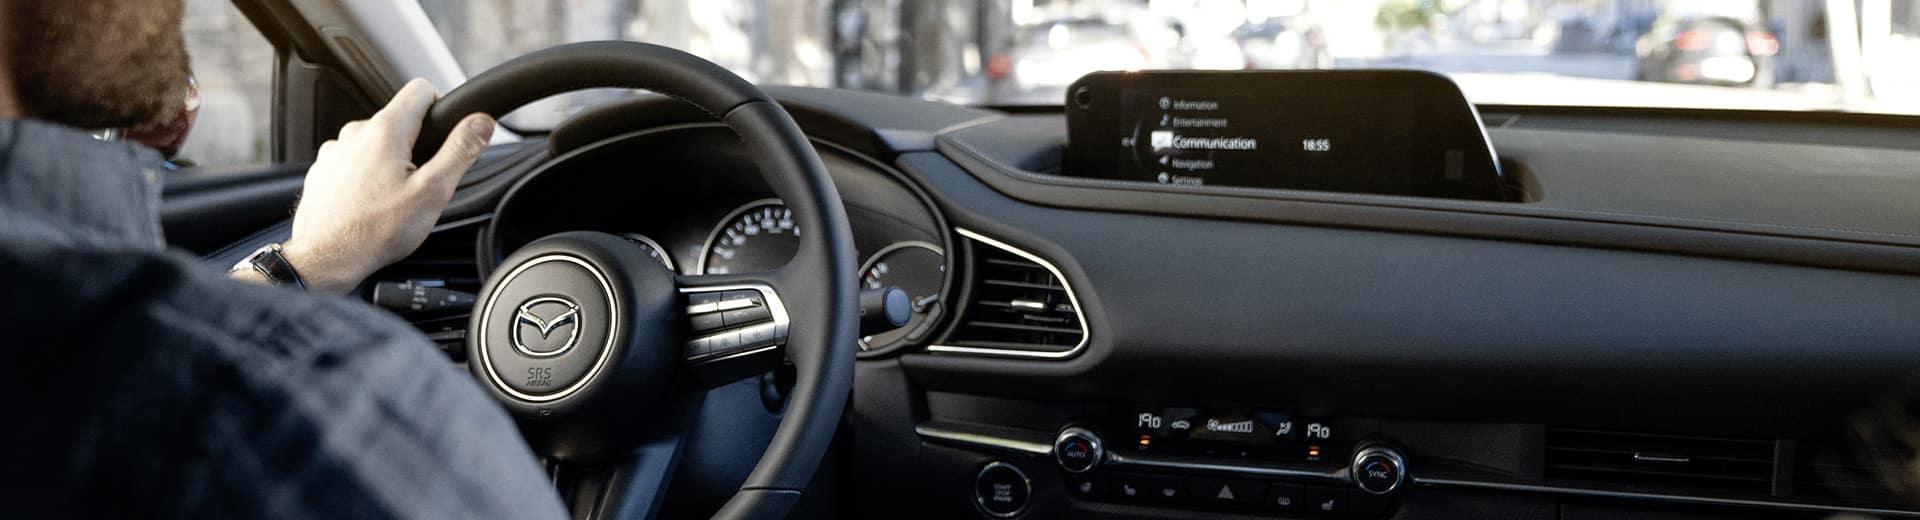 Mazda CX-30 - Available Mazda Connect